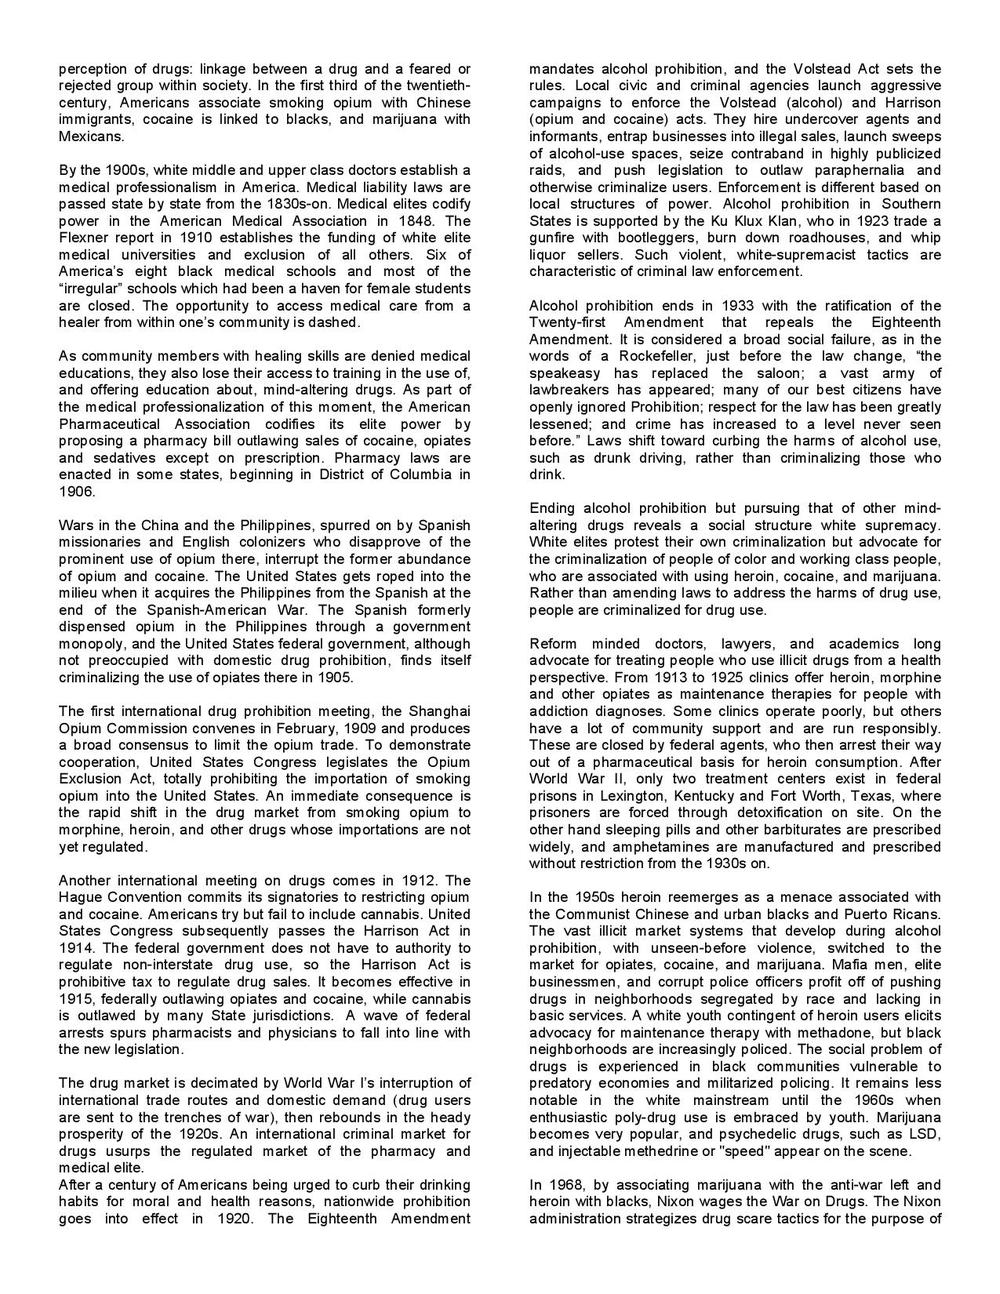 Timeline-page-007.jpg